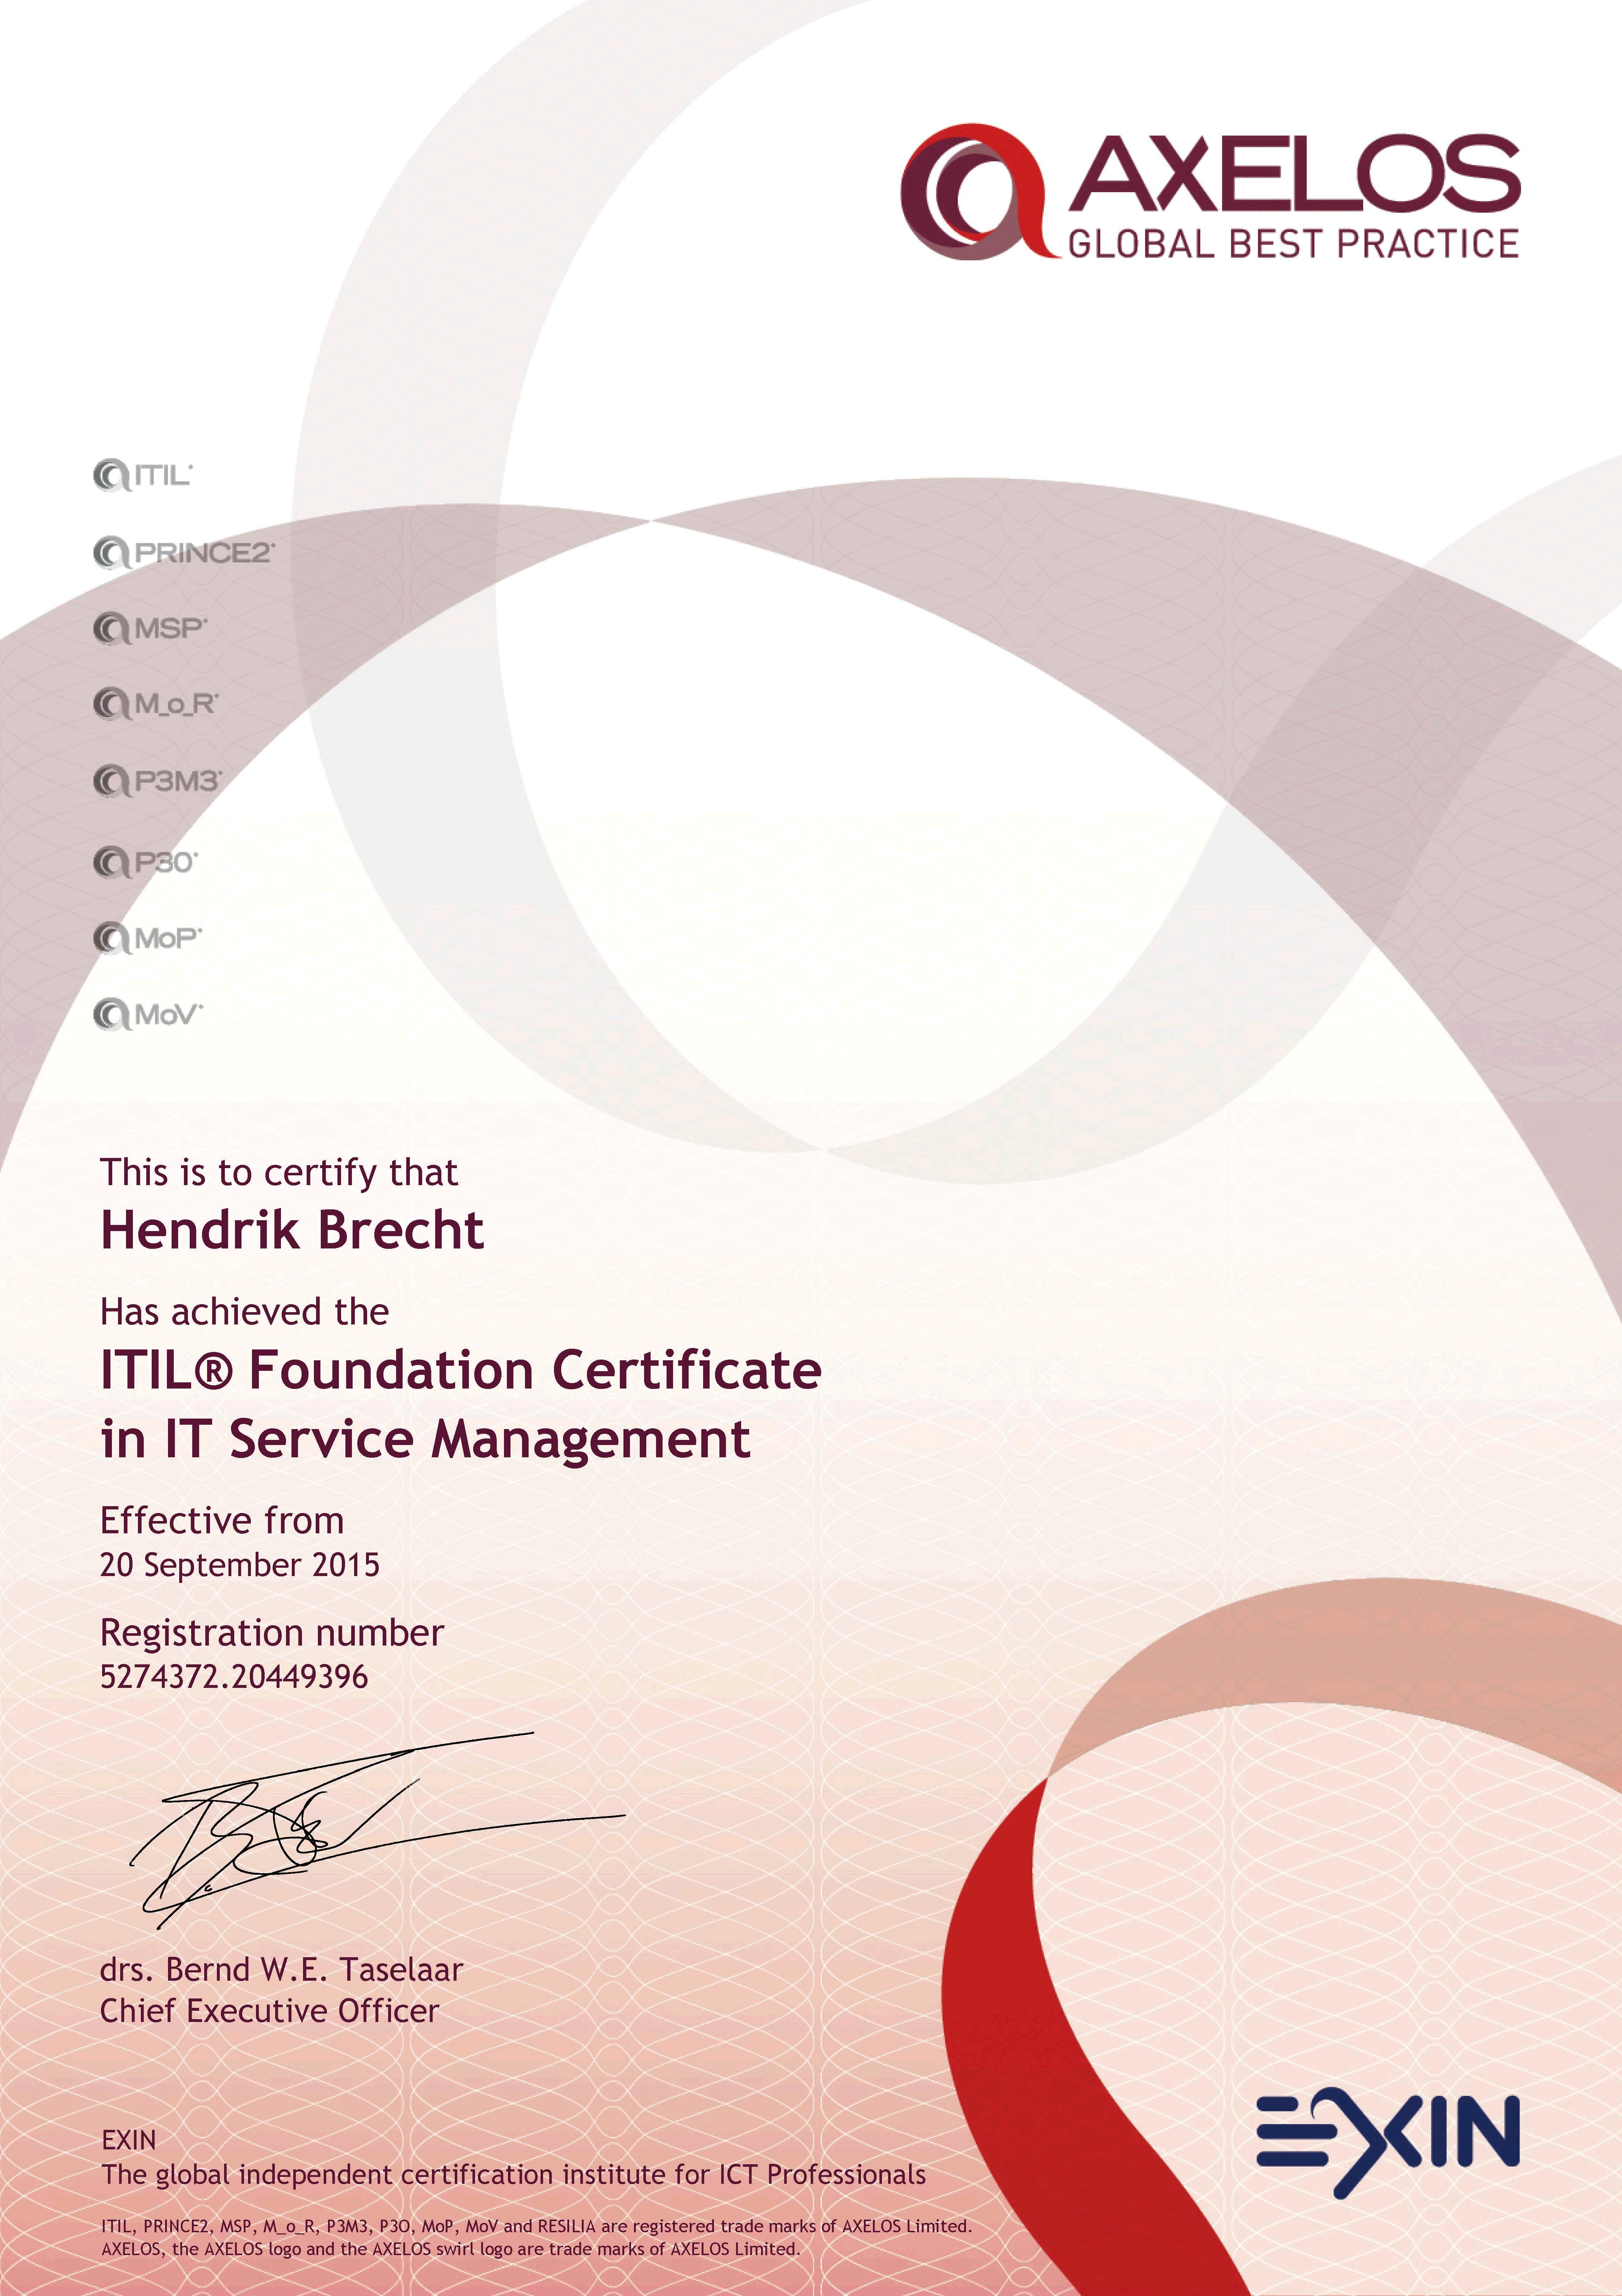 Hendrik Brecht - ITIL® Foundation Certificate in IT Service Management - 2015